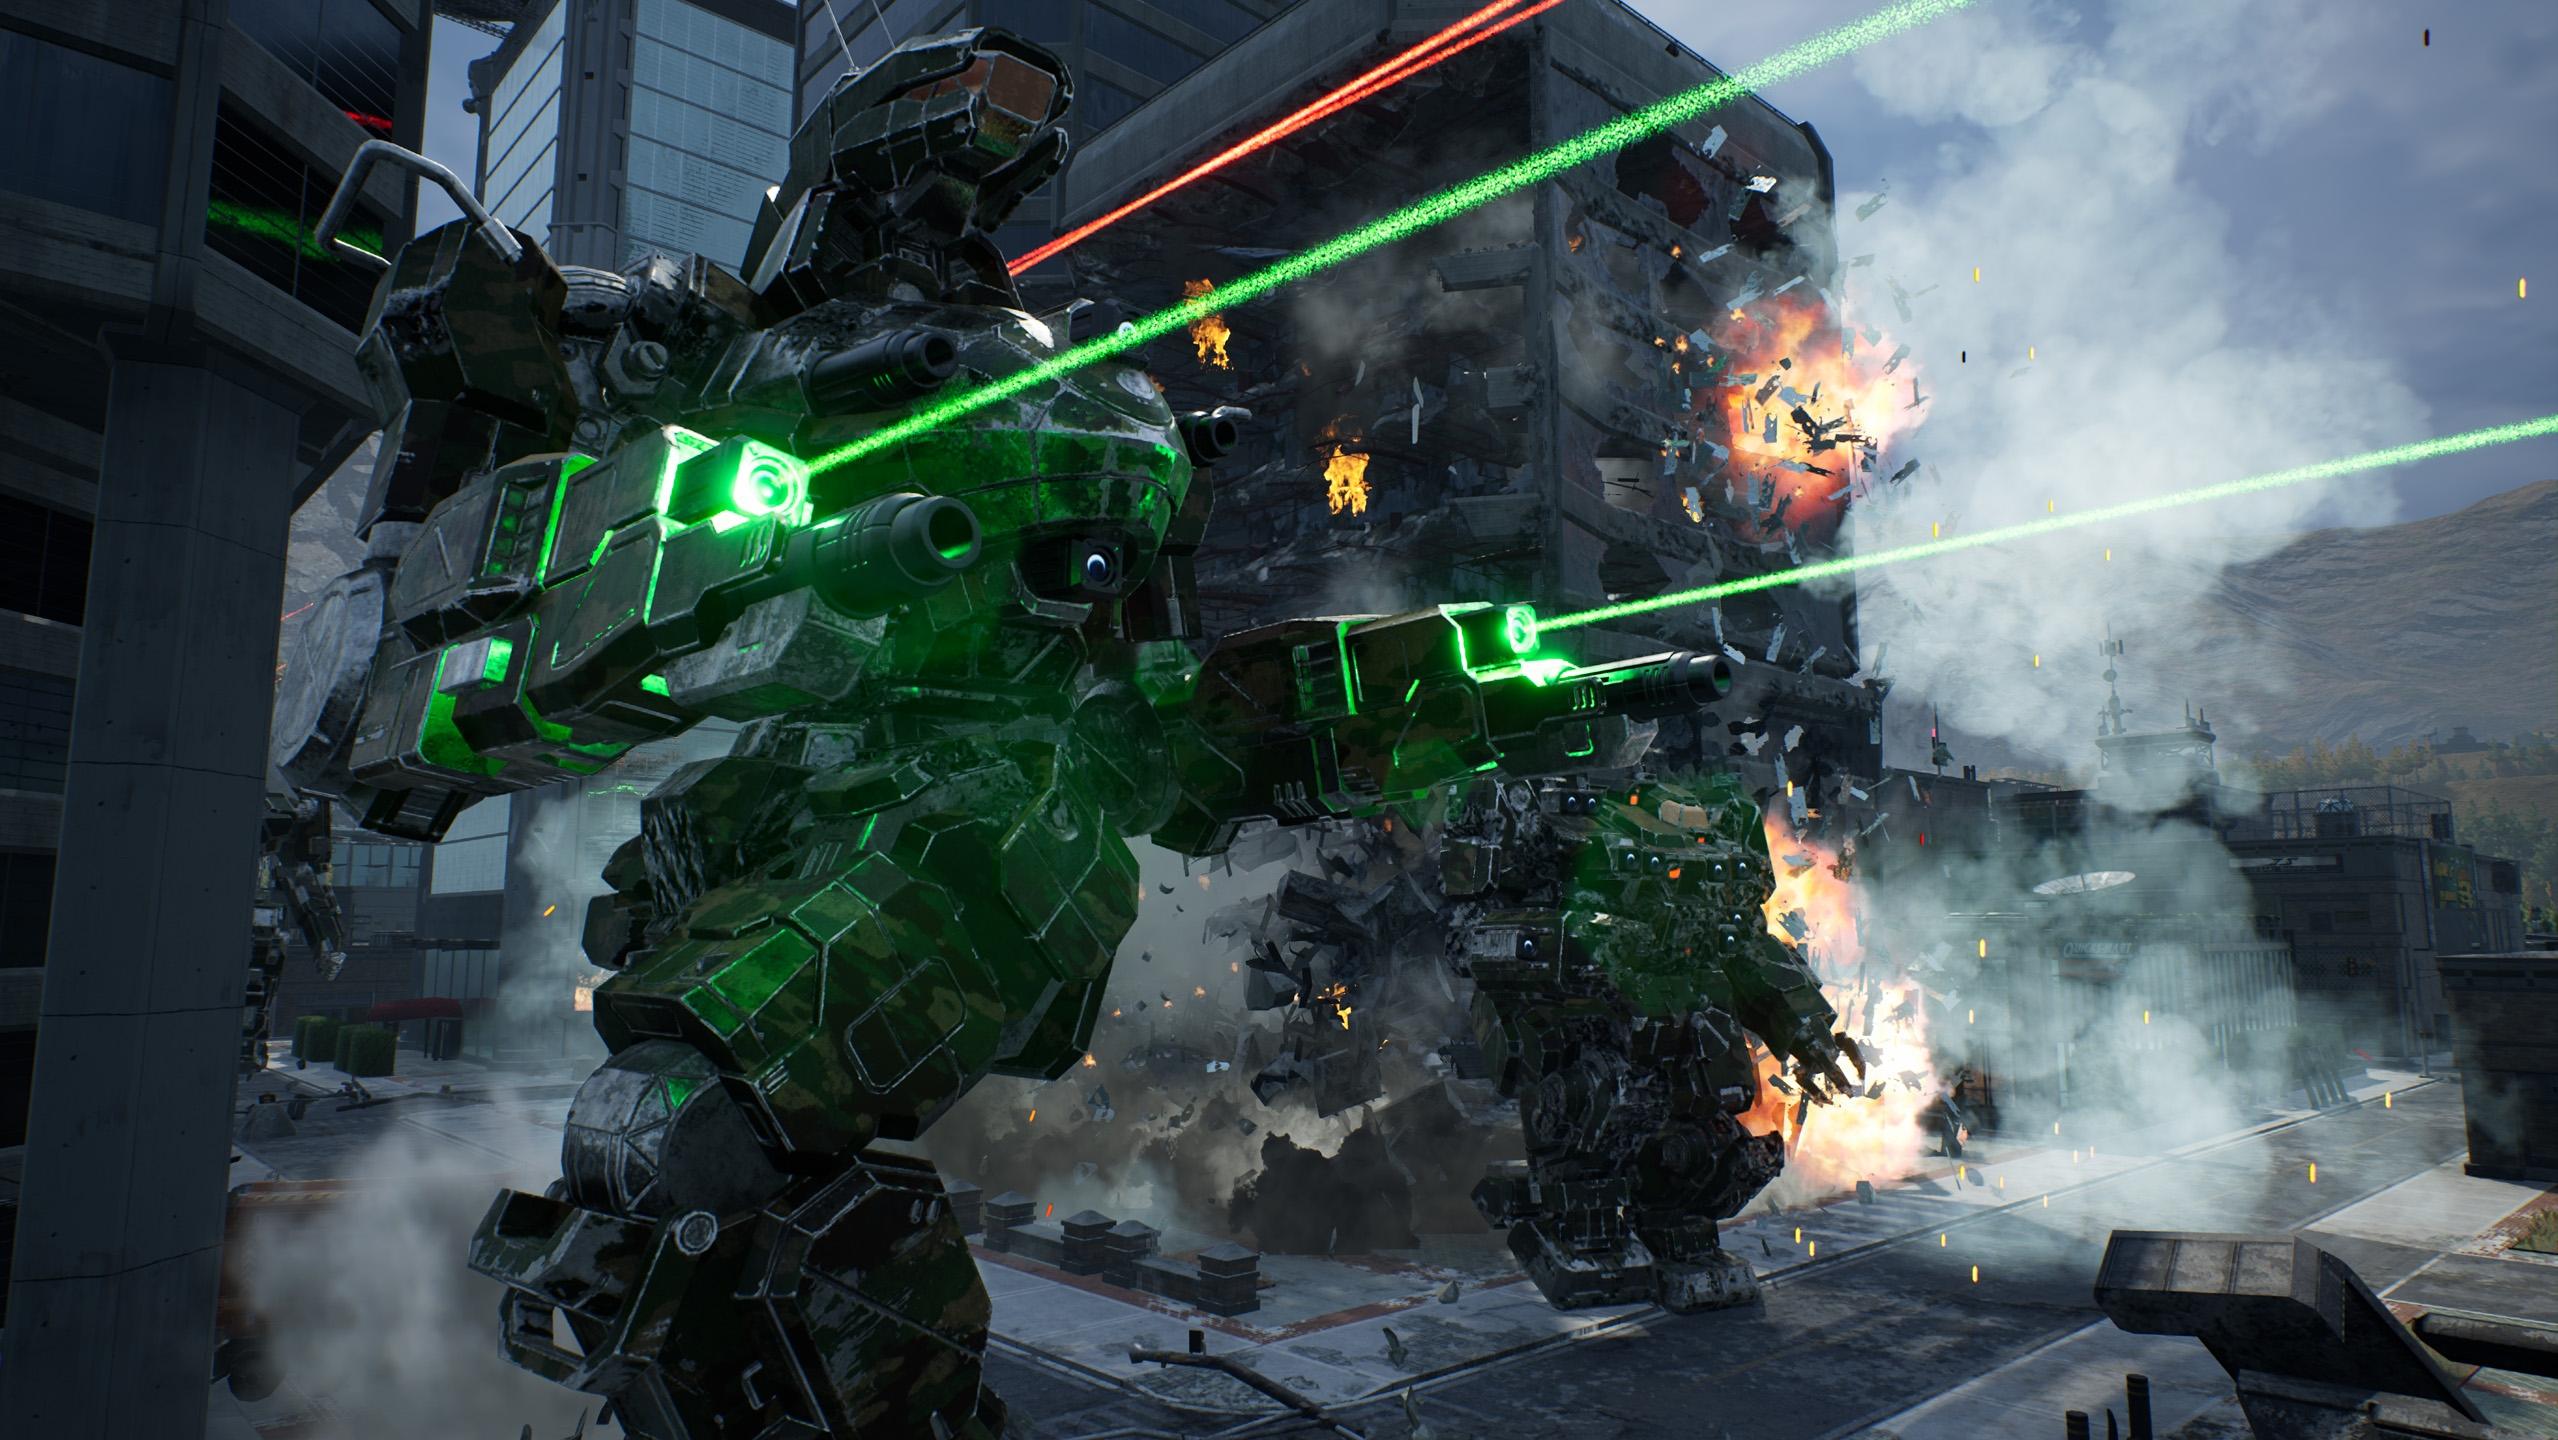 MechWarrior 5: Mercenaries   TUR_IND (d536aa68-0fe4-4bed-99d4-1b548947ccf8)